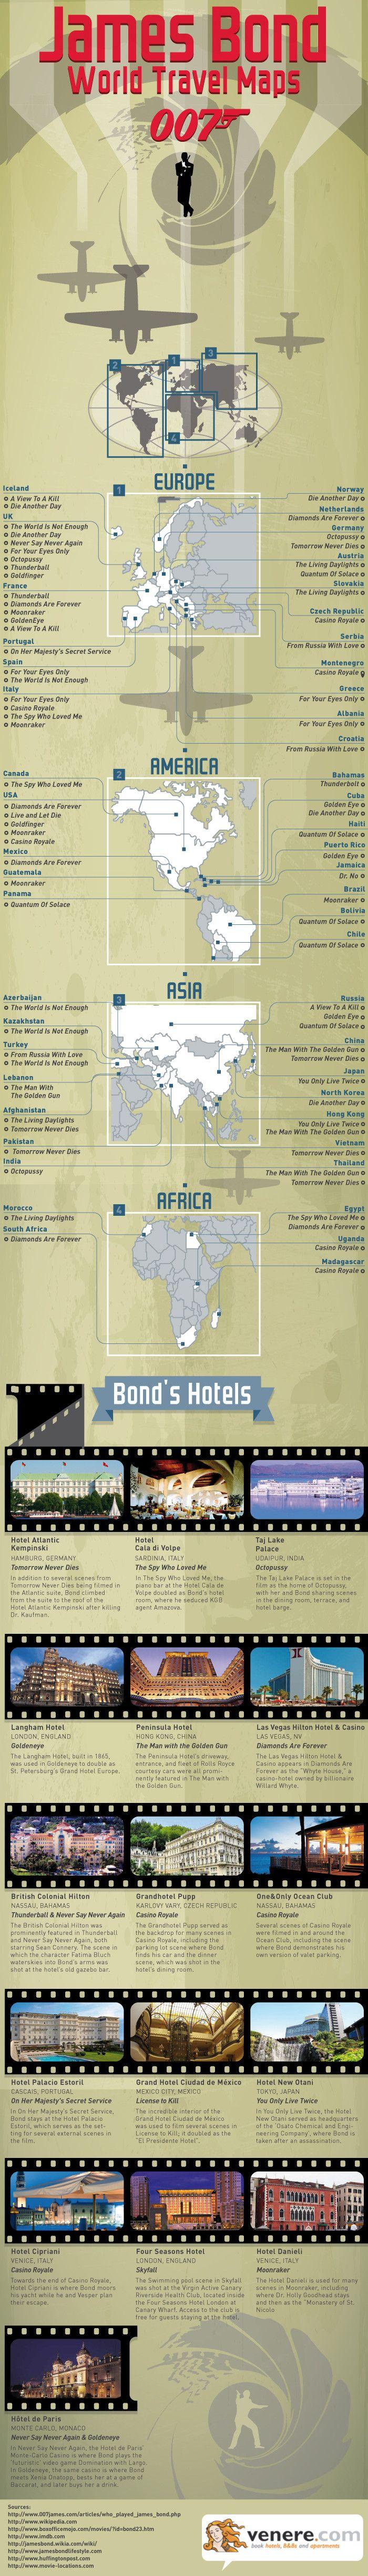 James Bond World Travel Maps